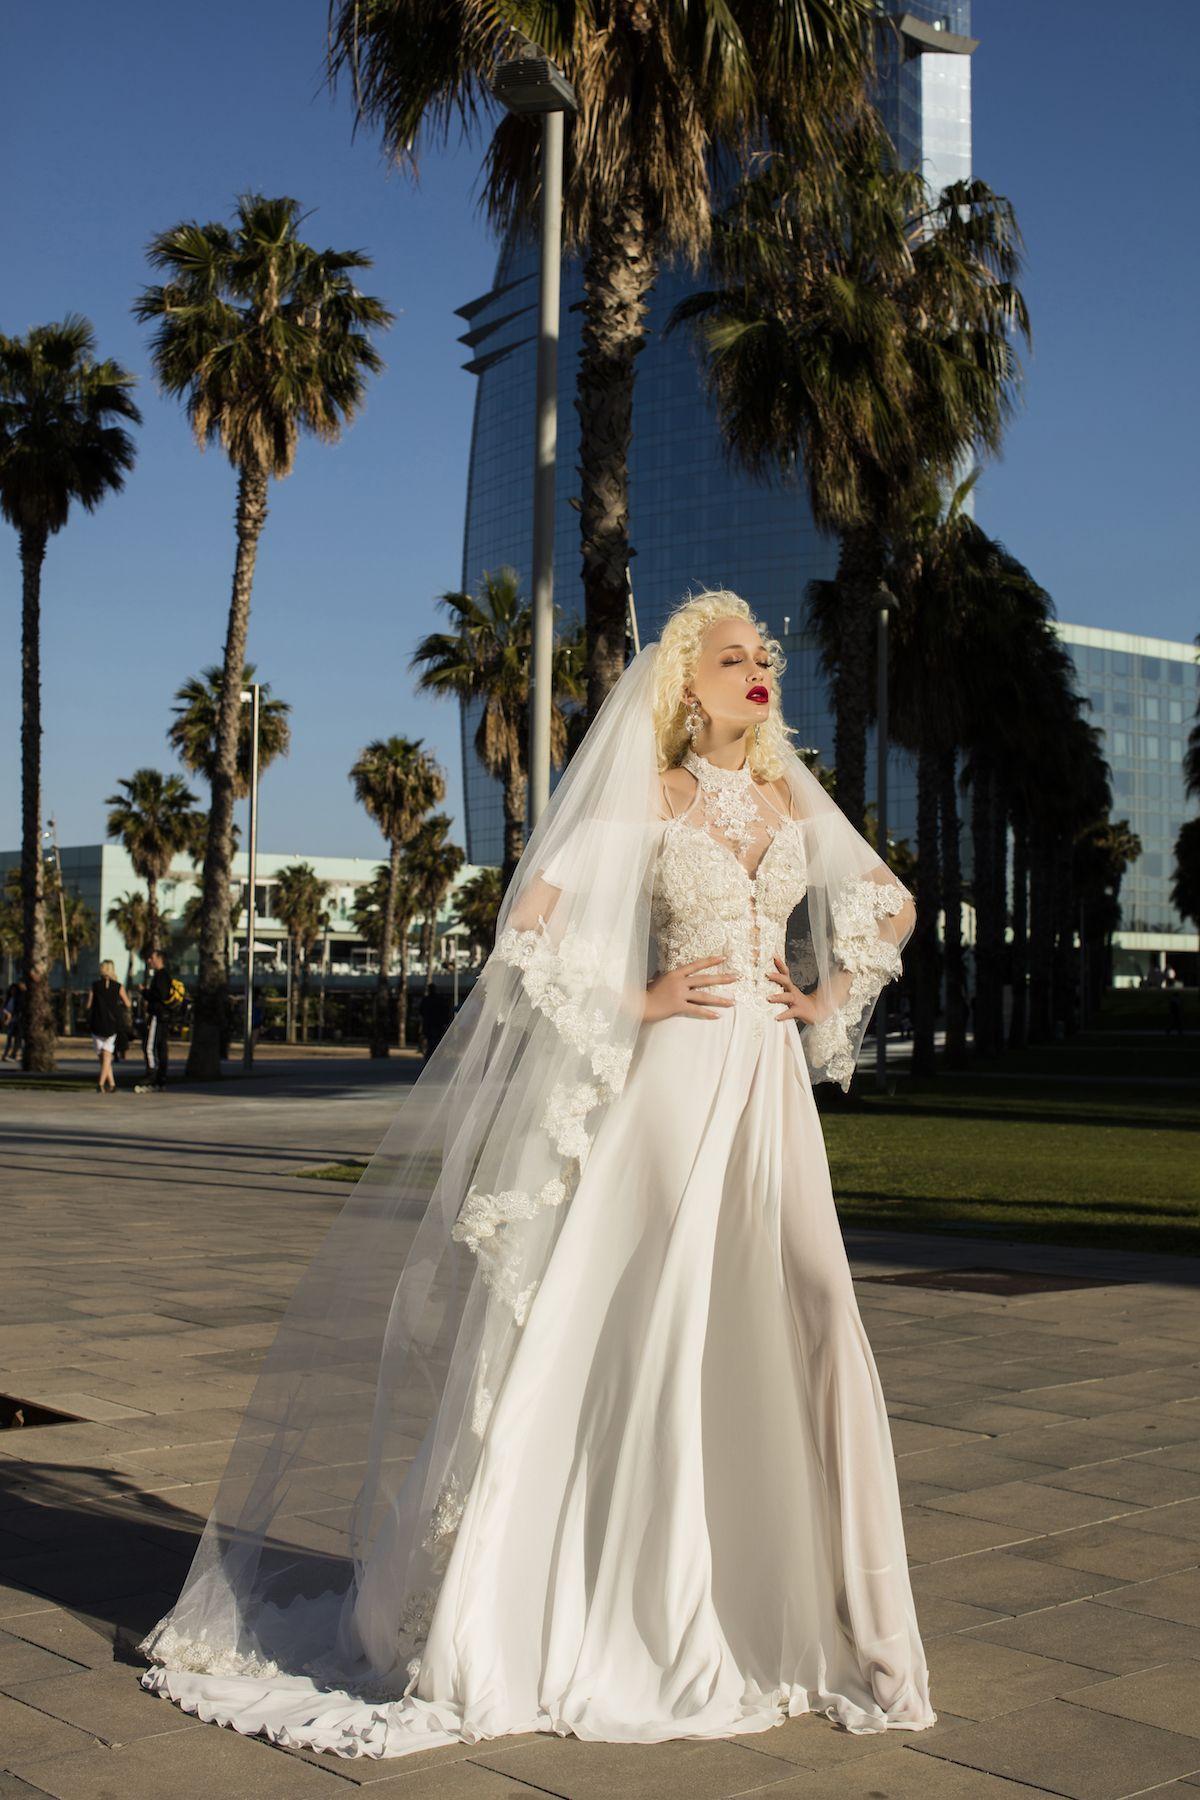 Wedding Dress Mit Long Veil Bridal Dresses Wedding Dresses Bride